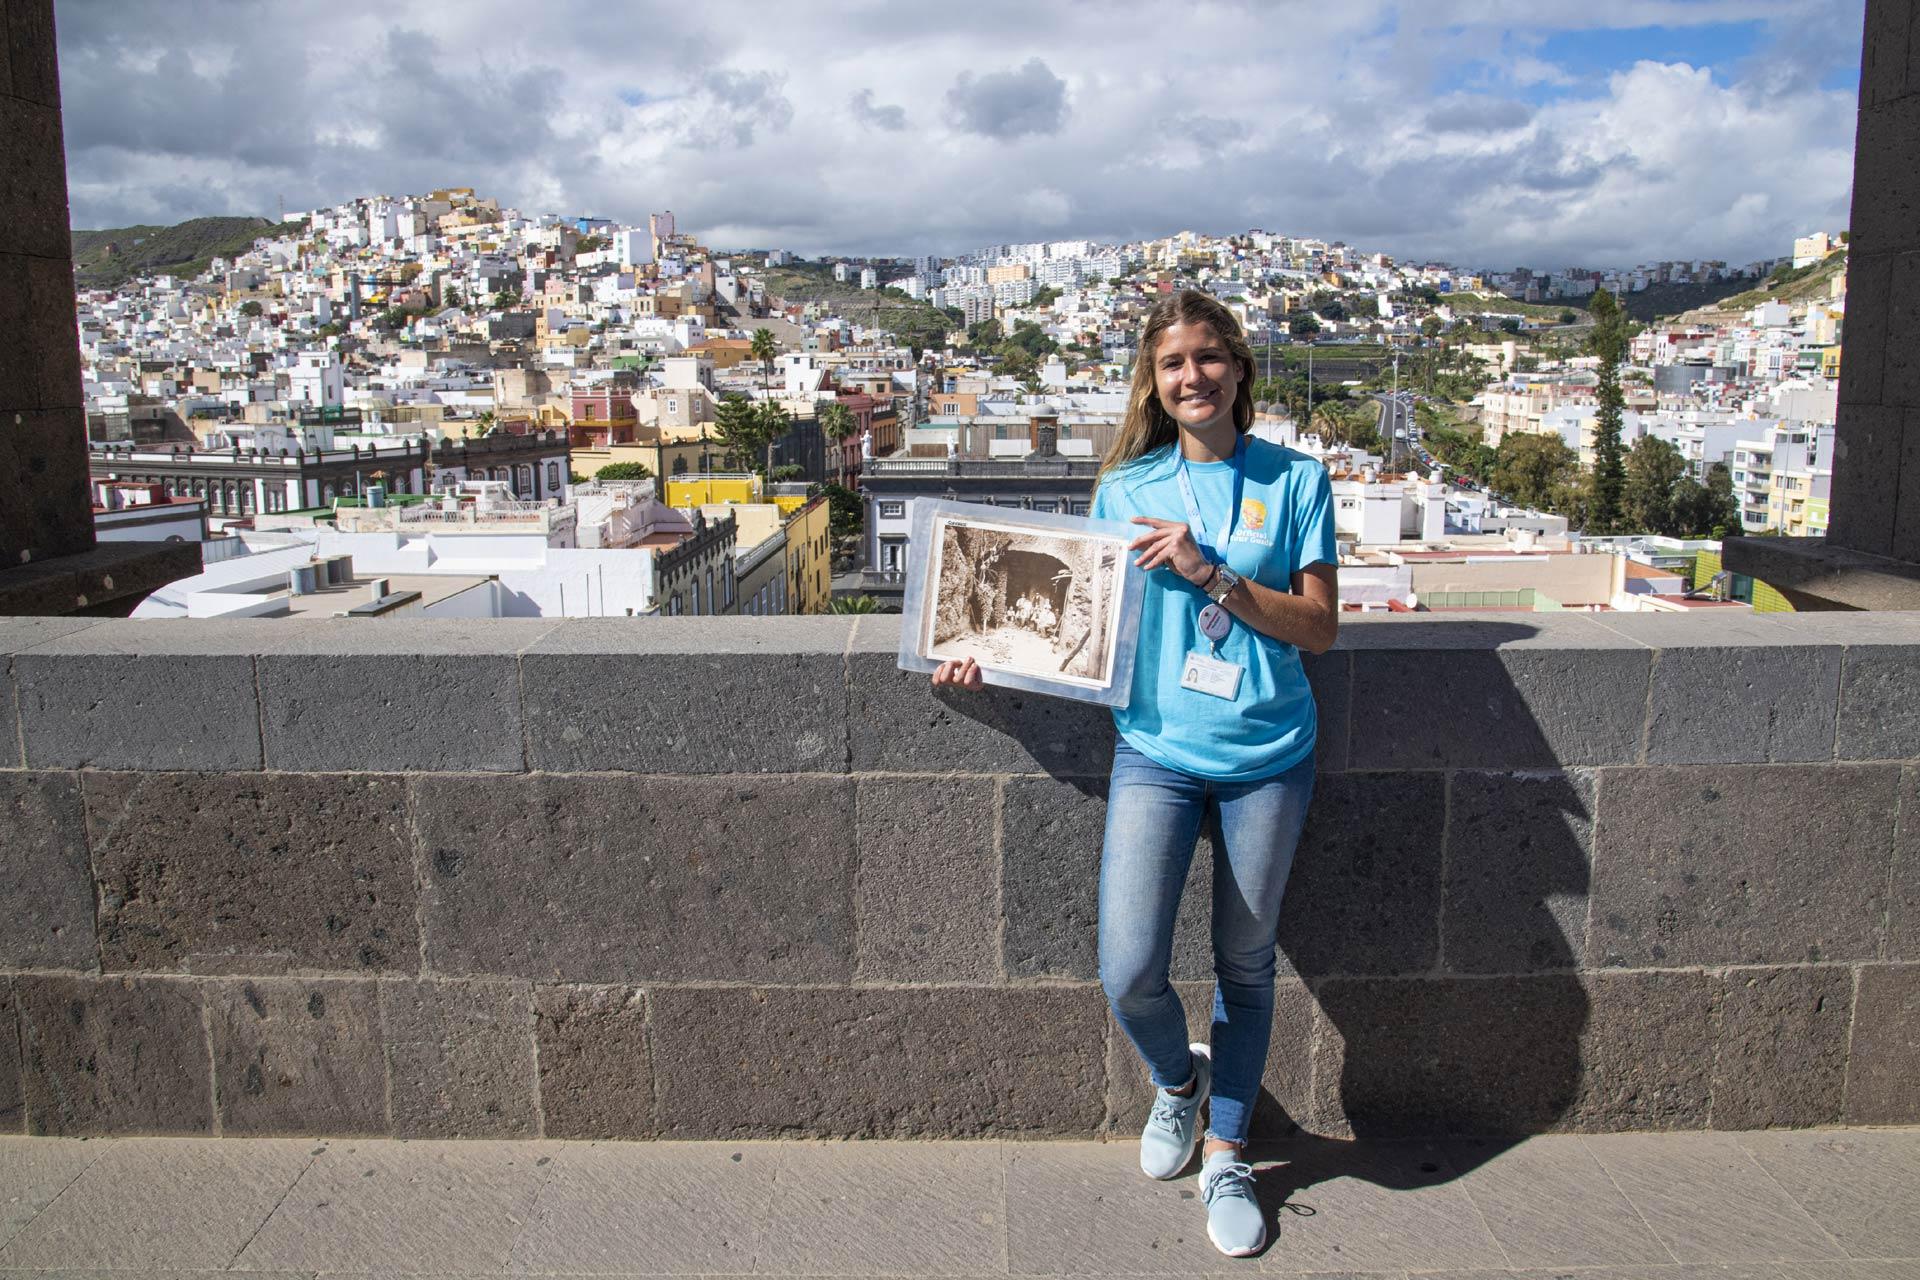 Selene Álvarez Guía turistico oficial